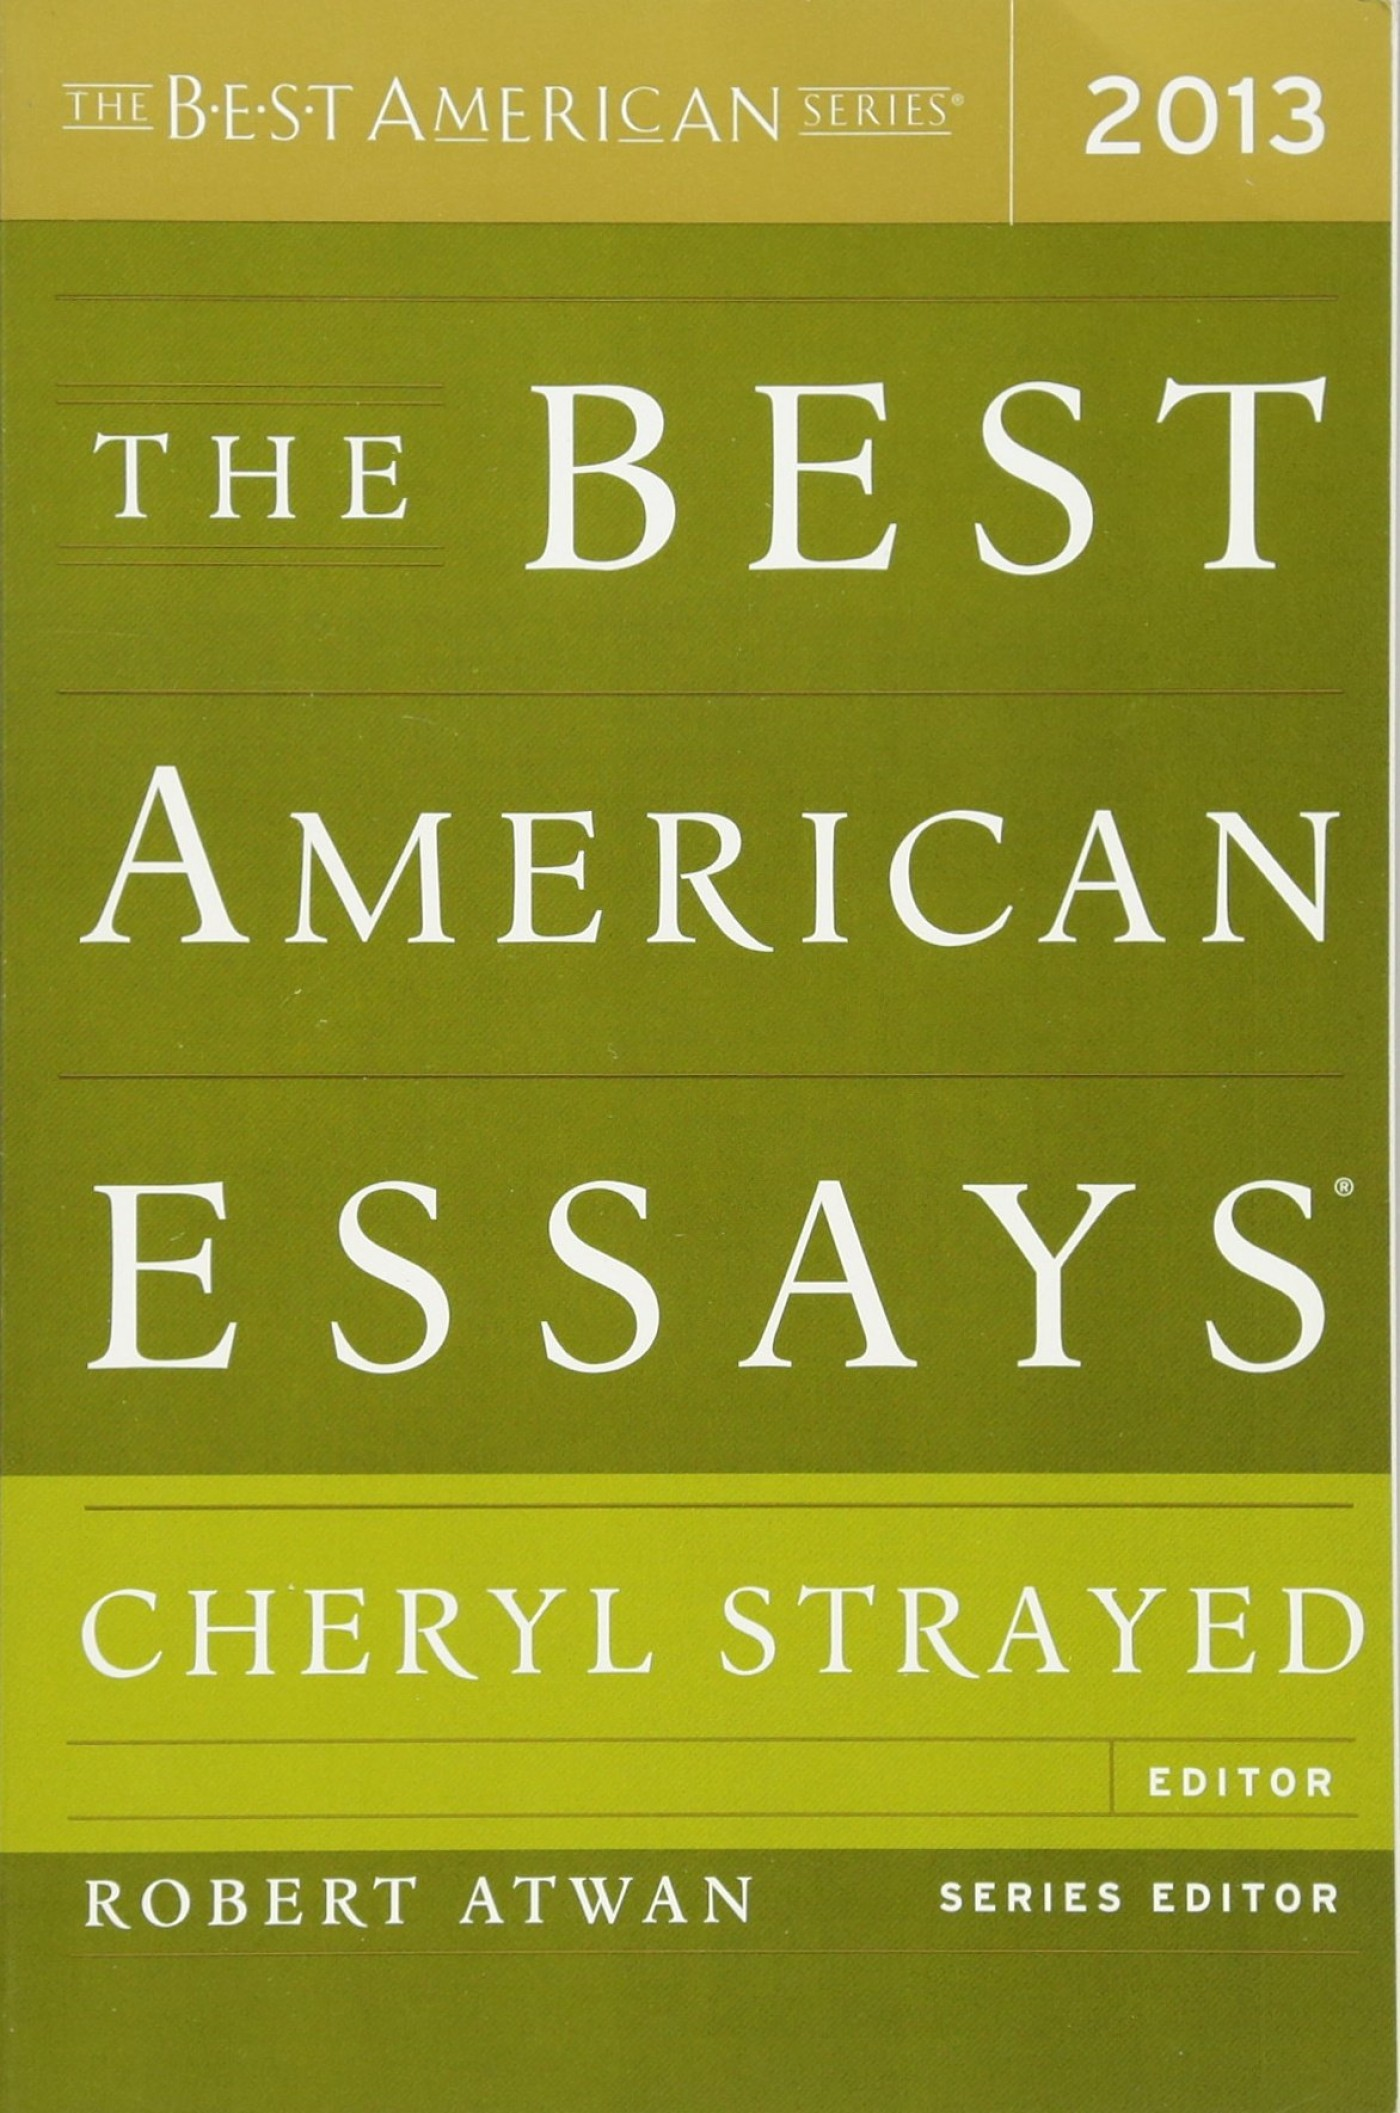 003 The Best American Essays 81nkls2j9vl Essay Wonderful 2018 Pdf 2017 Table Of Contents 2015 Free 1400